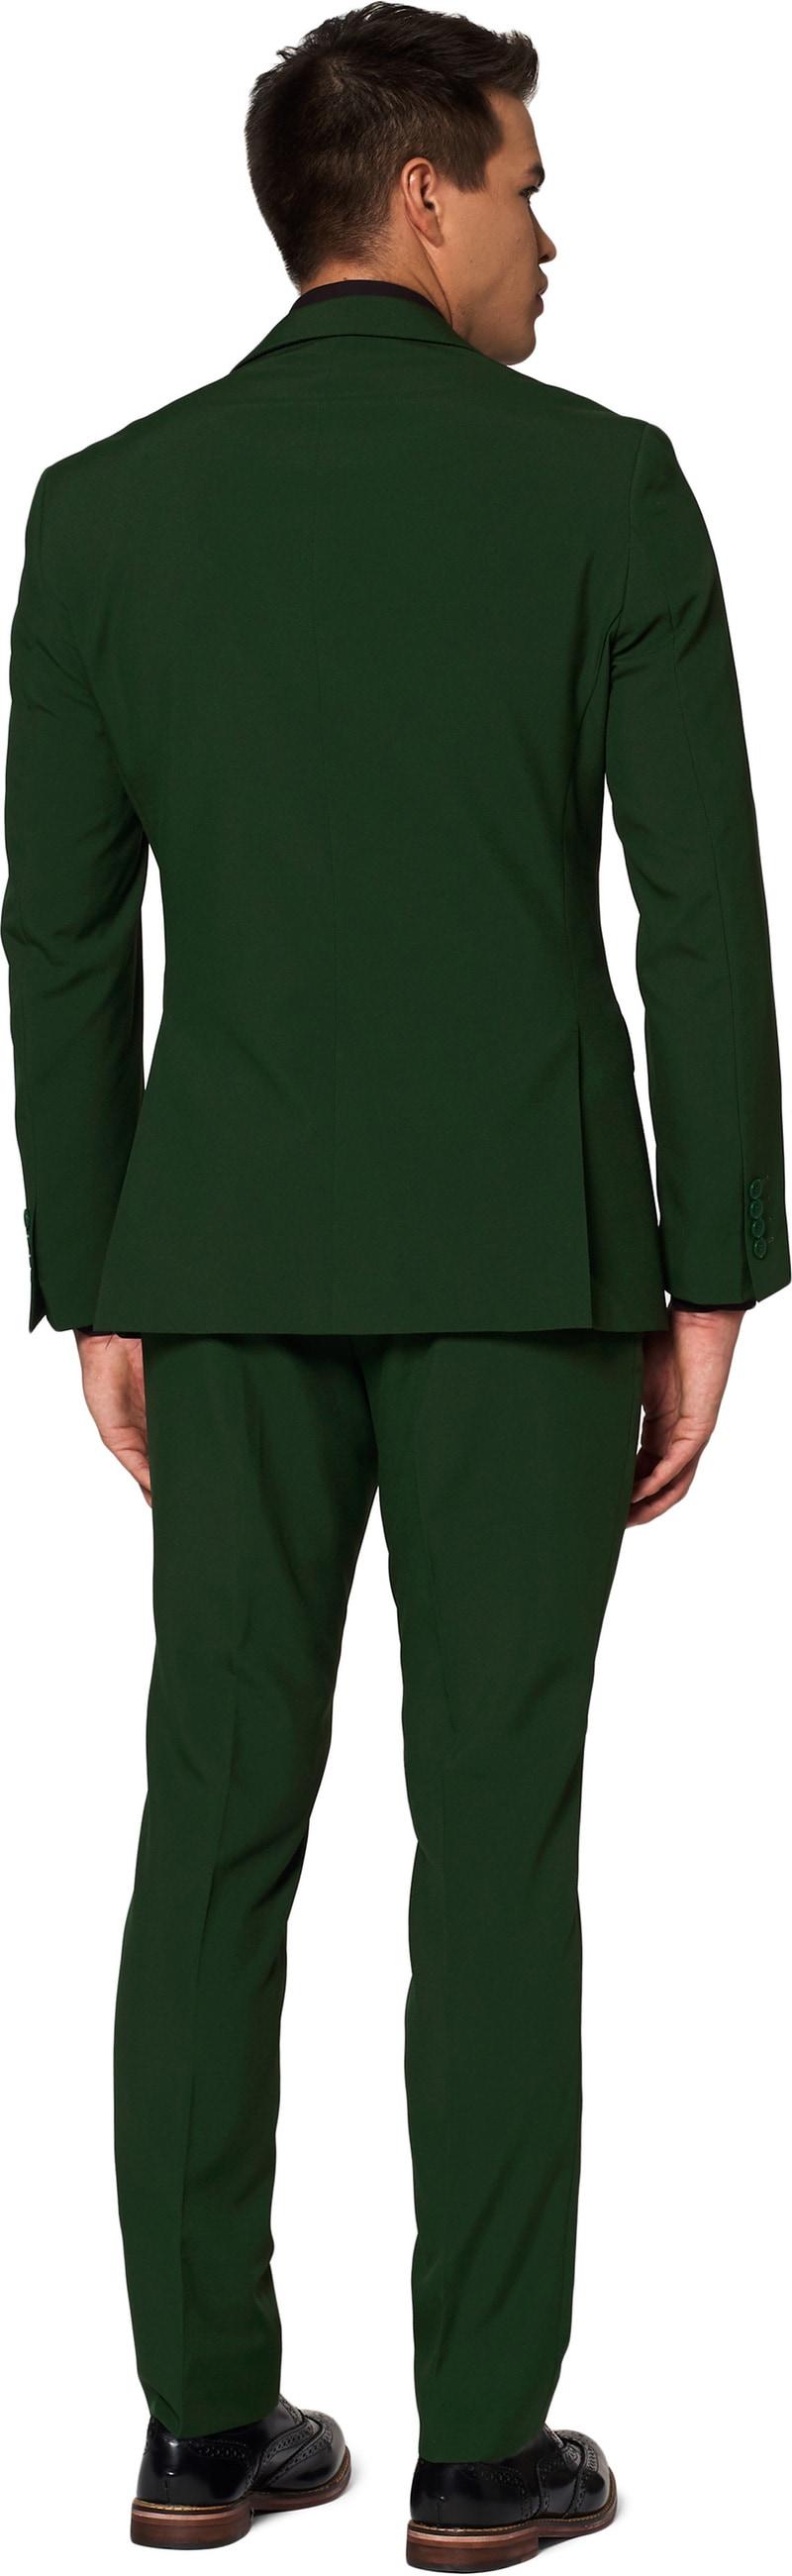 OppoSuits Kostuum Glorious Green foto 1